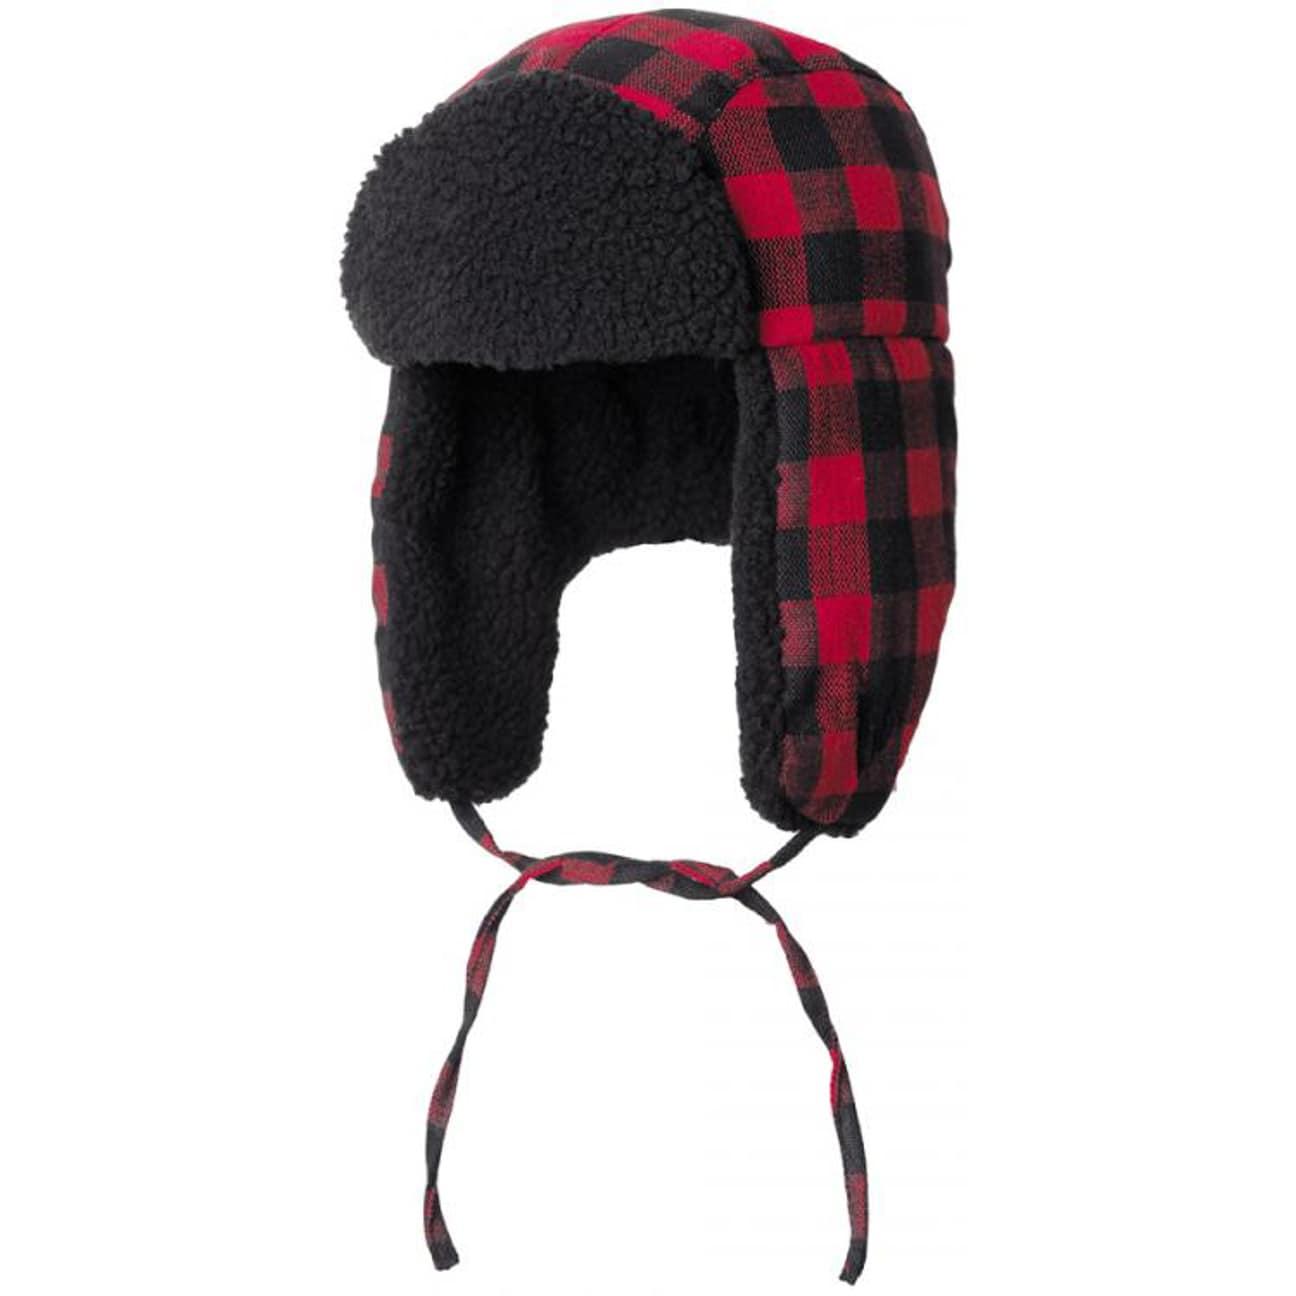 2da43fbb95d Lumberjack Aviator Hat by bruno banani - red 1 ...